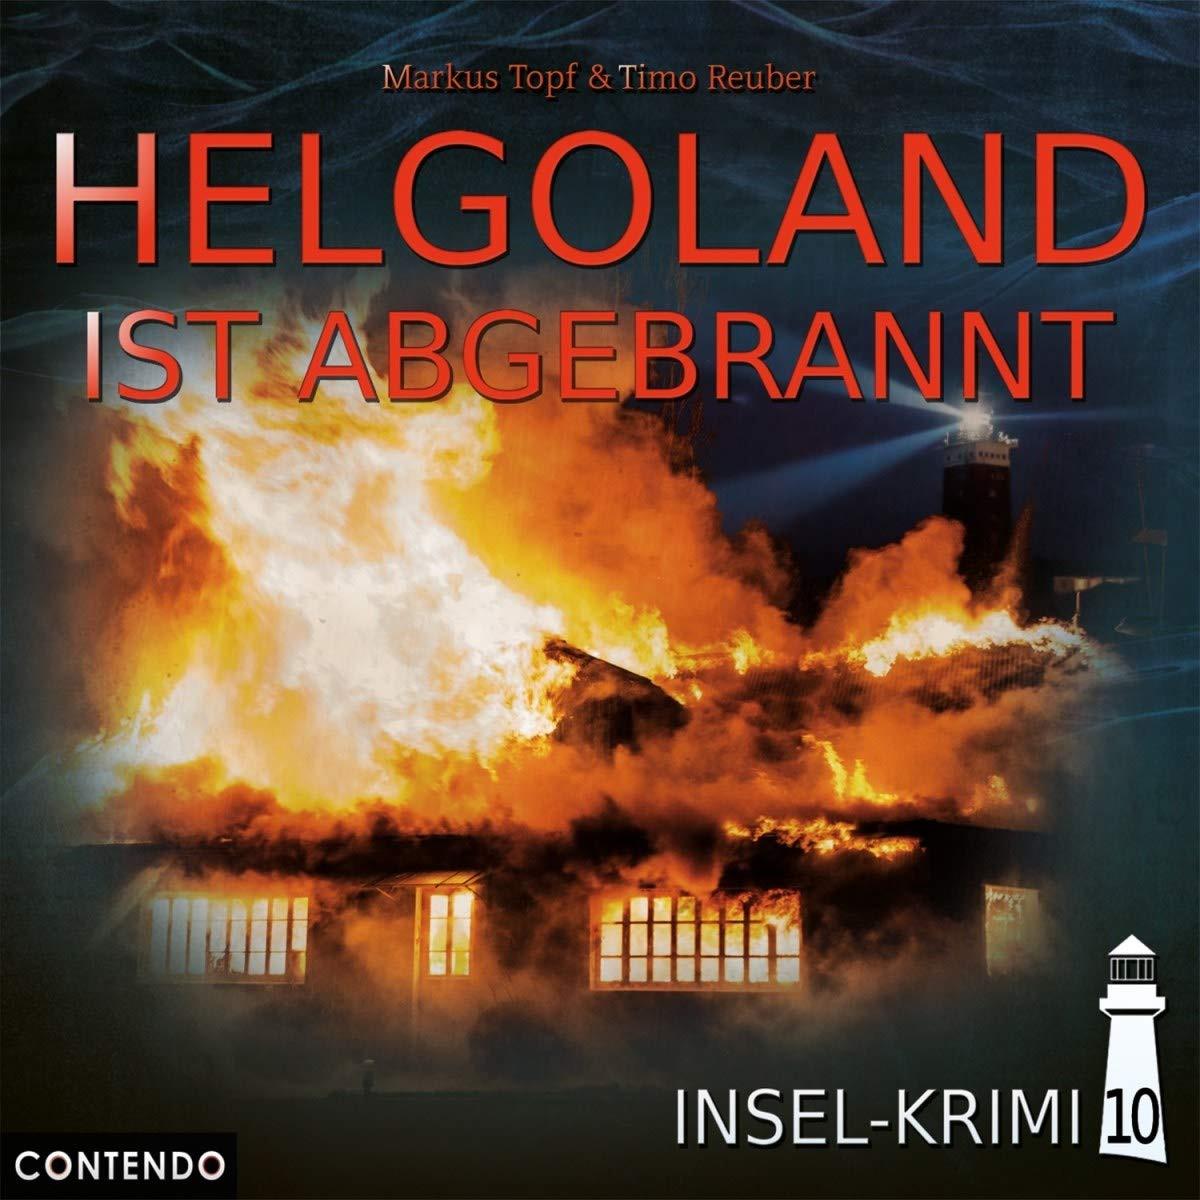 Insel-Krimi - Folge 10: Helgoland Ist Abgebrannt